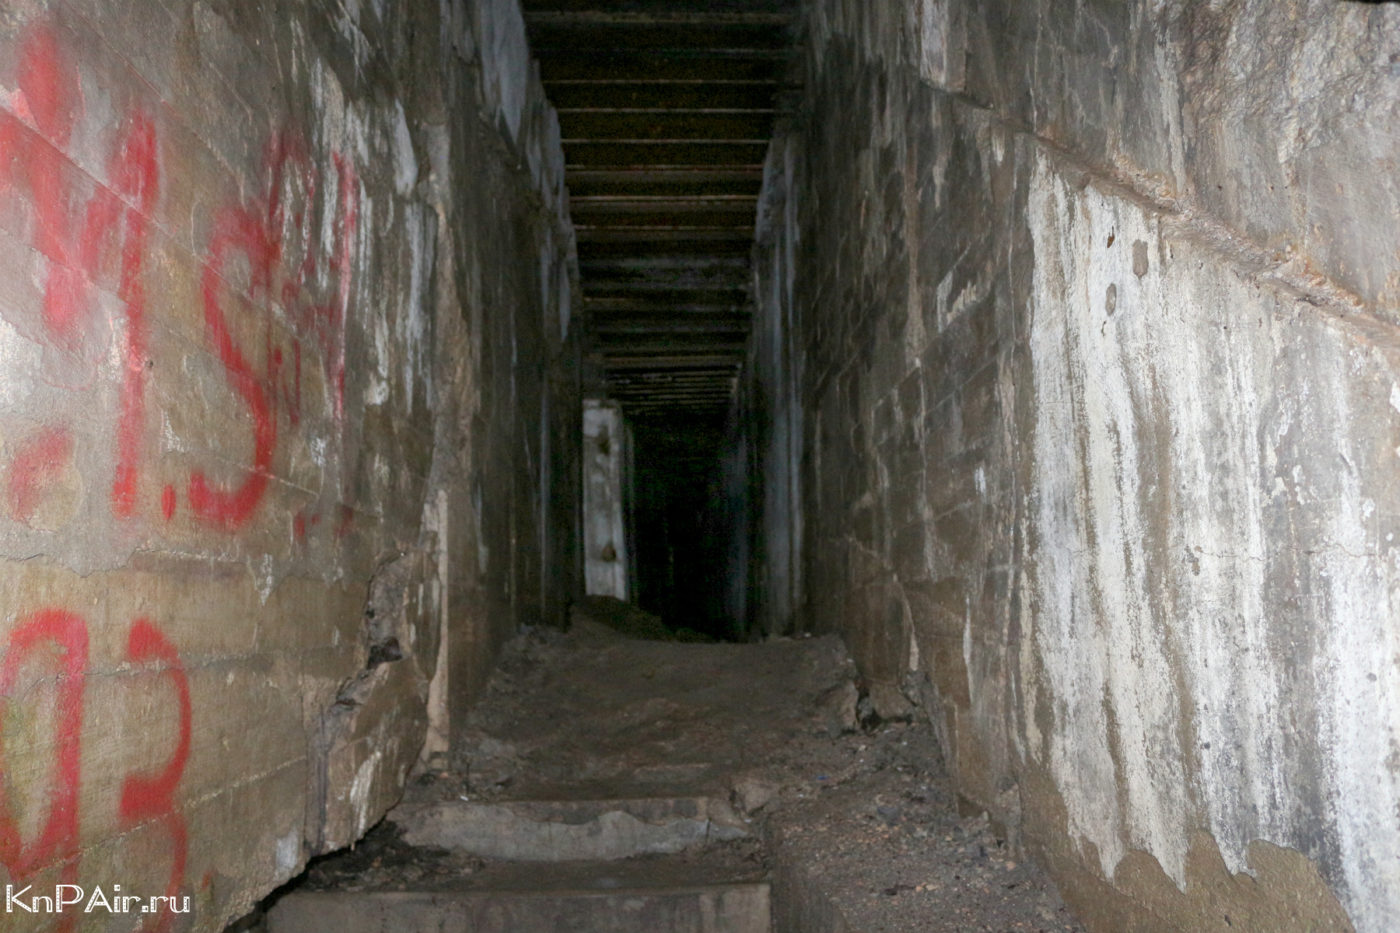 Koridory-vnutri-bunkerov-v-Volchiem-logove